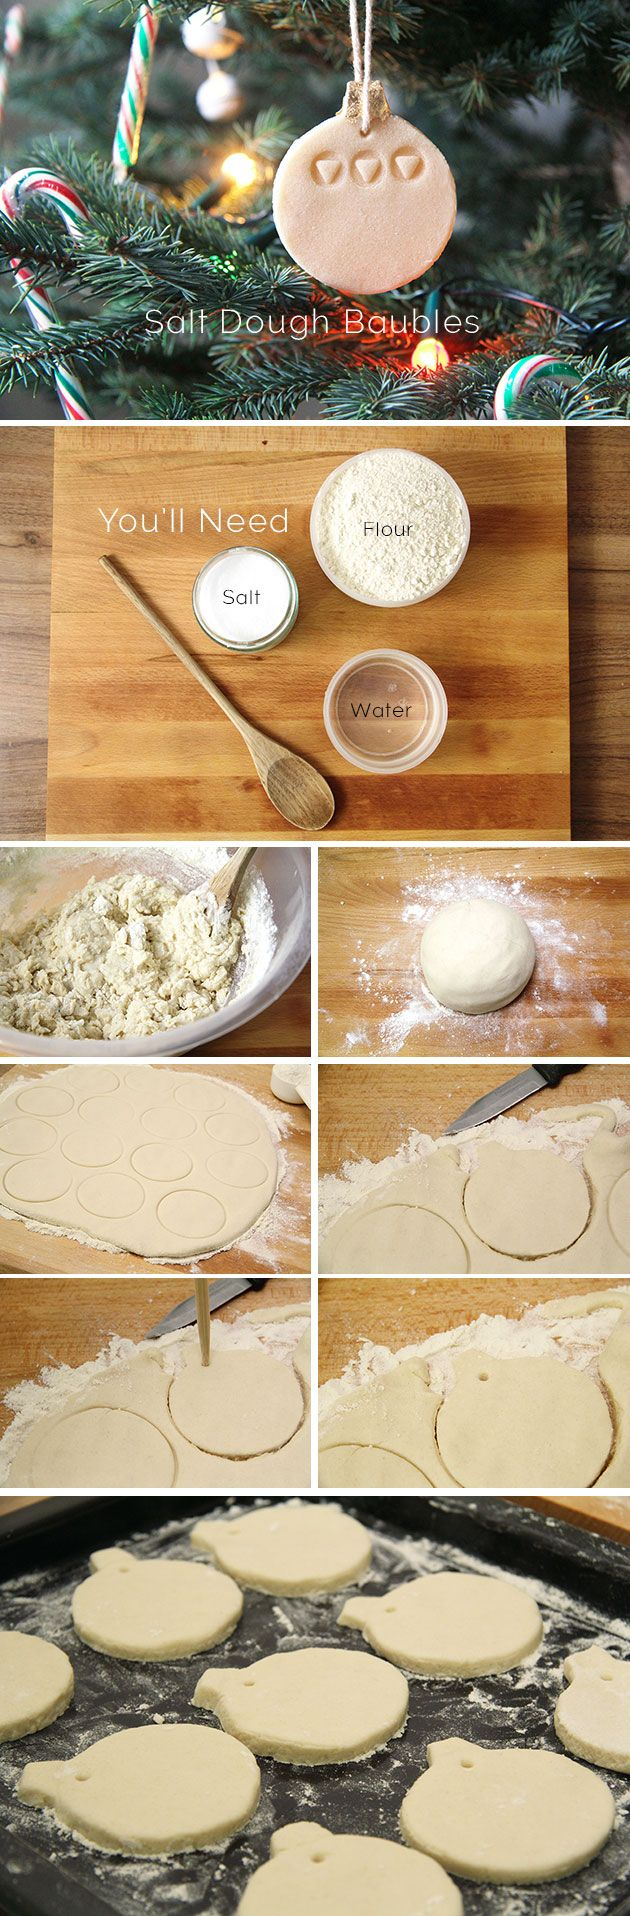 68 best Salt dough crafts images on Pinterest  Salt dough crafts